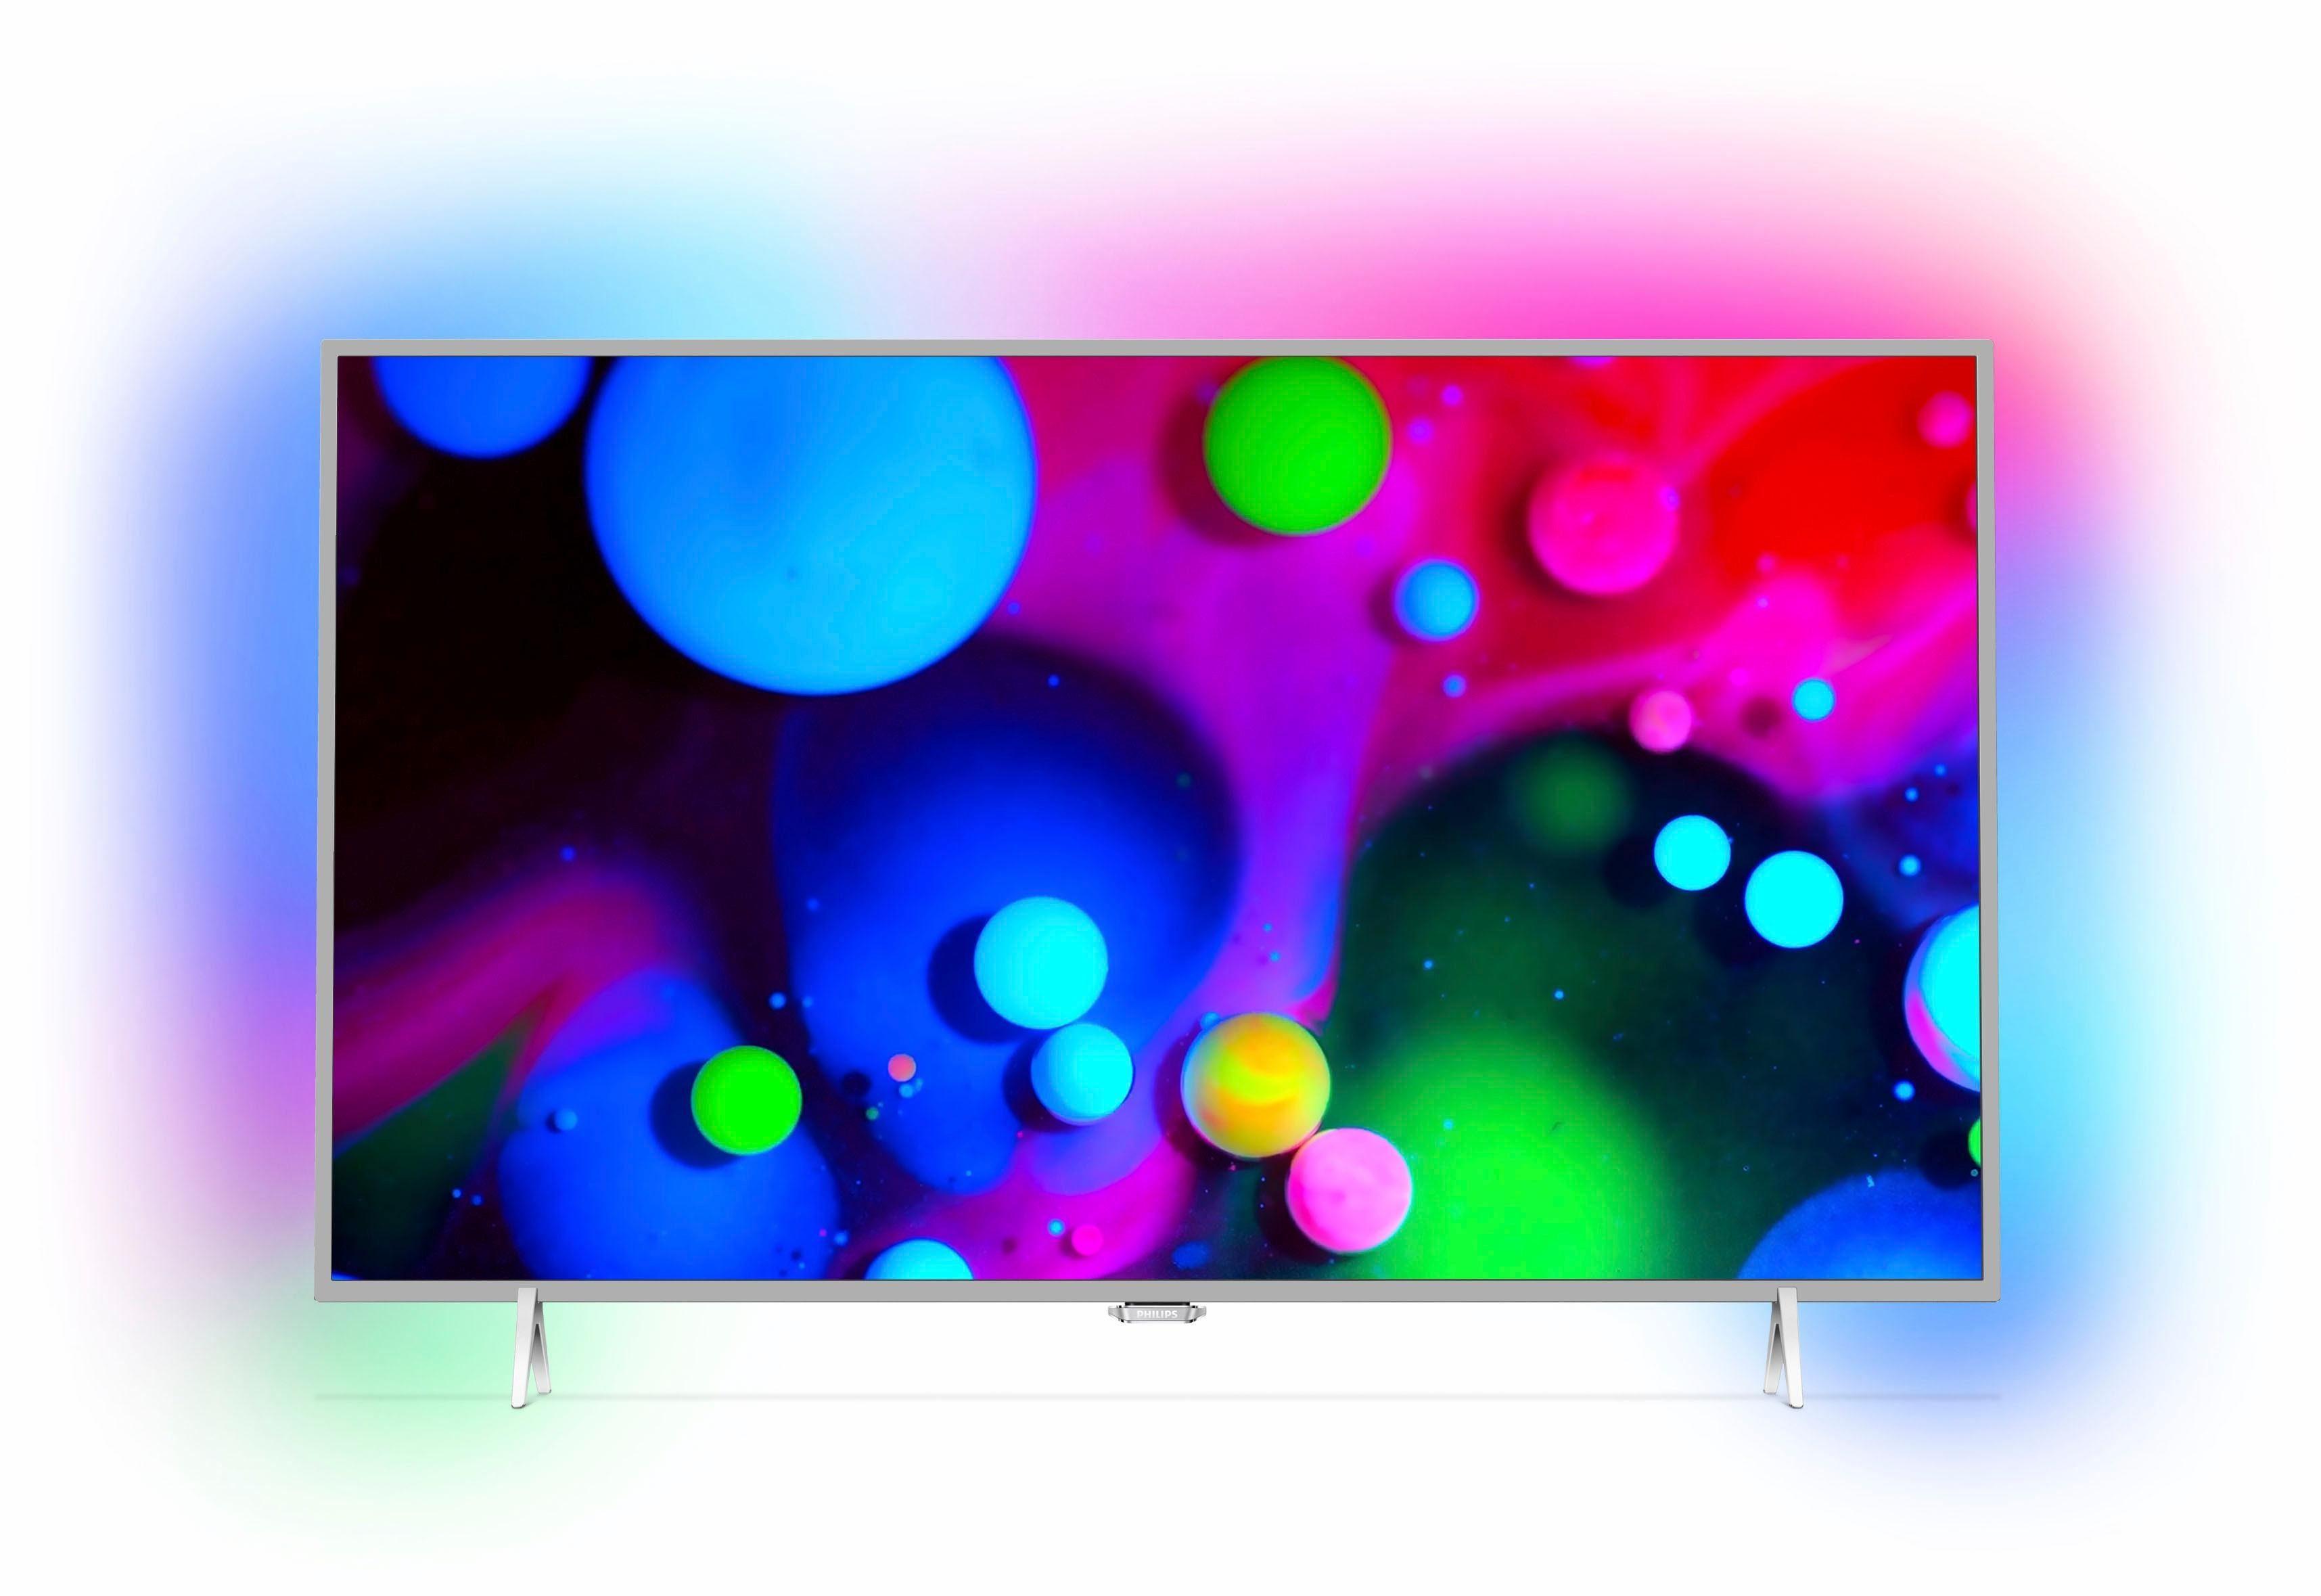 Philips 49PUS6452 LED-Fernseher (49 Zoll, 4K Ultra HD, Smart-TV, Ambilight)